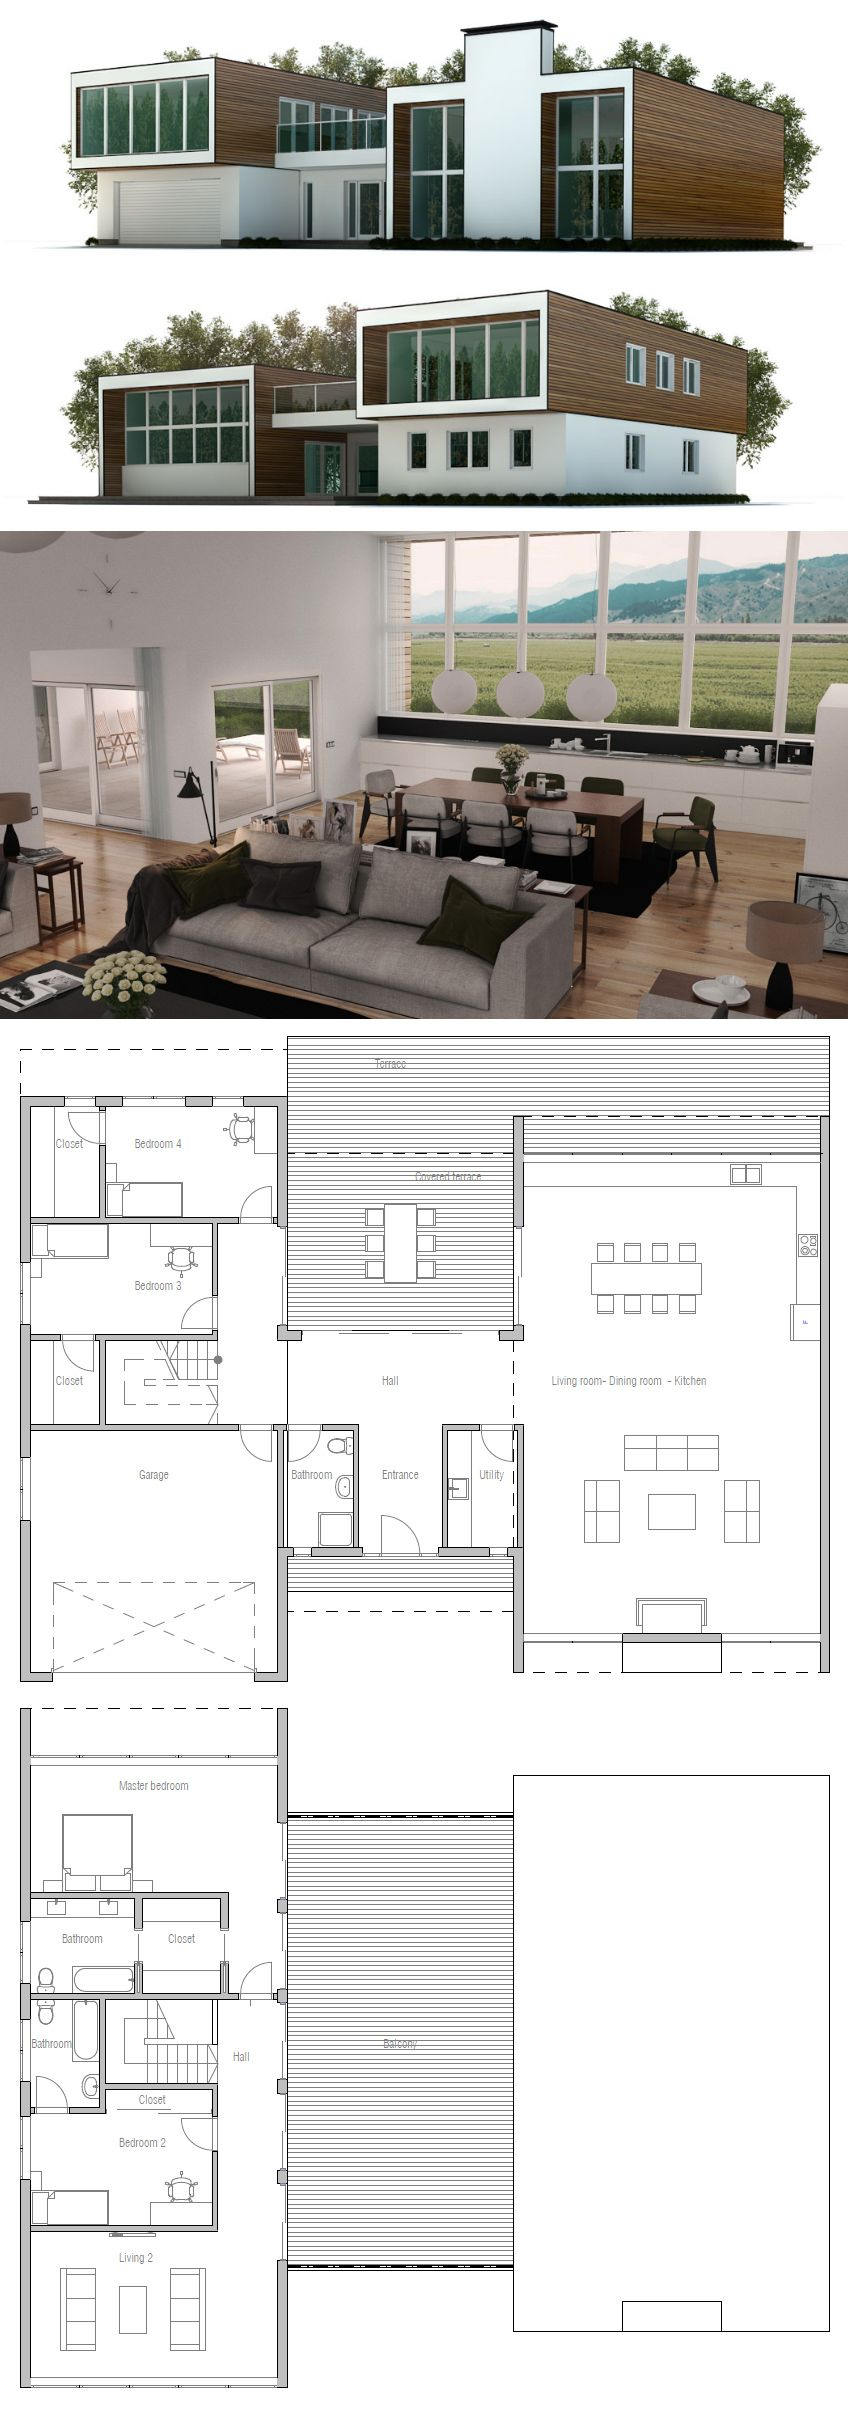 Hauspläne modern  Modern House Plan | Hauspläne | Pinterest | Modern house plans ...